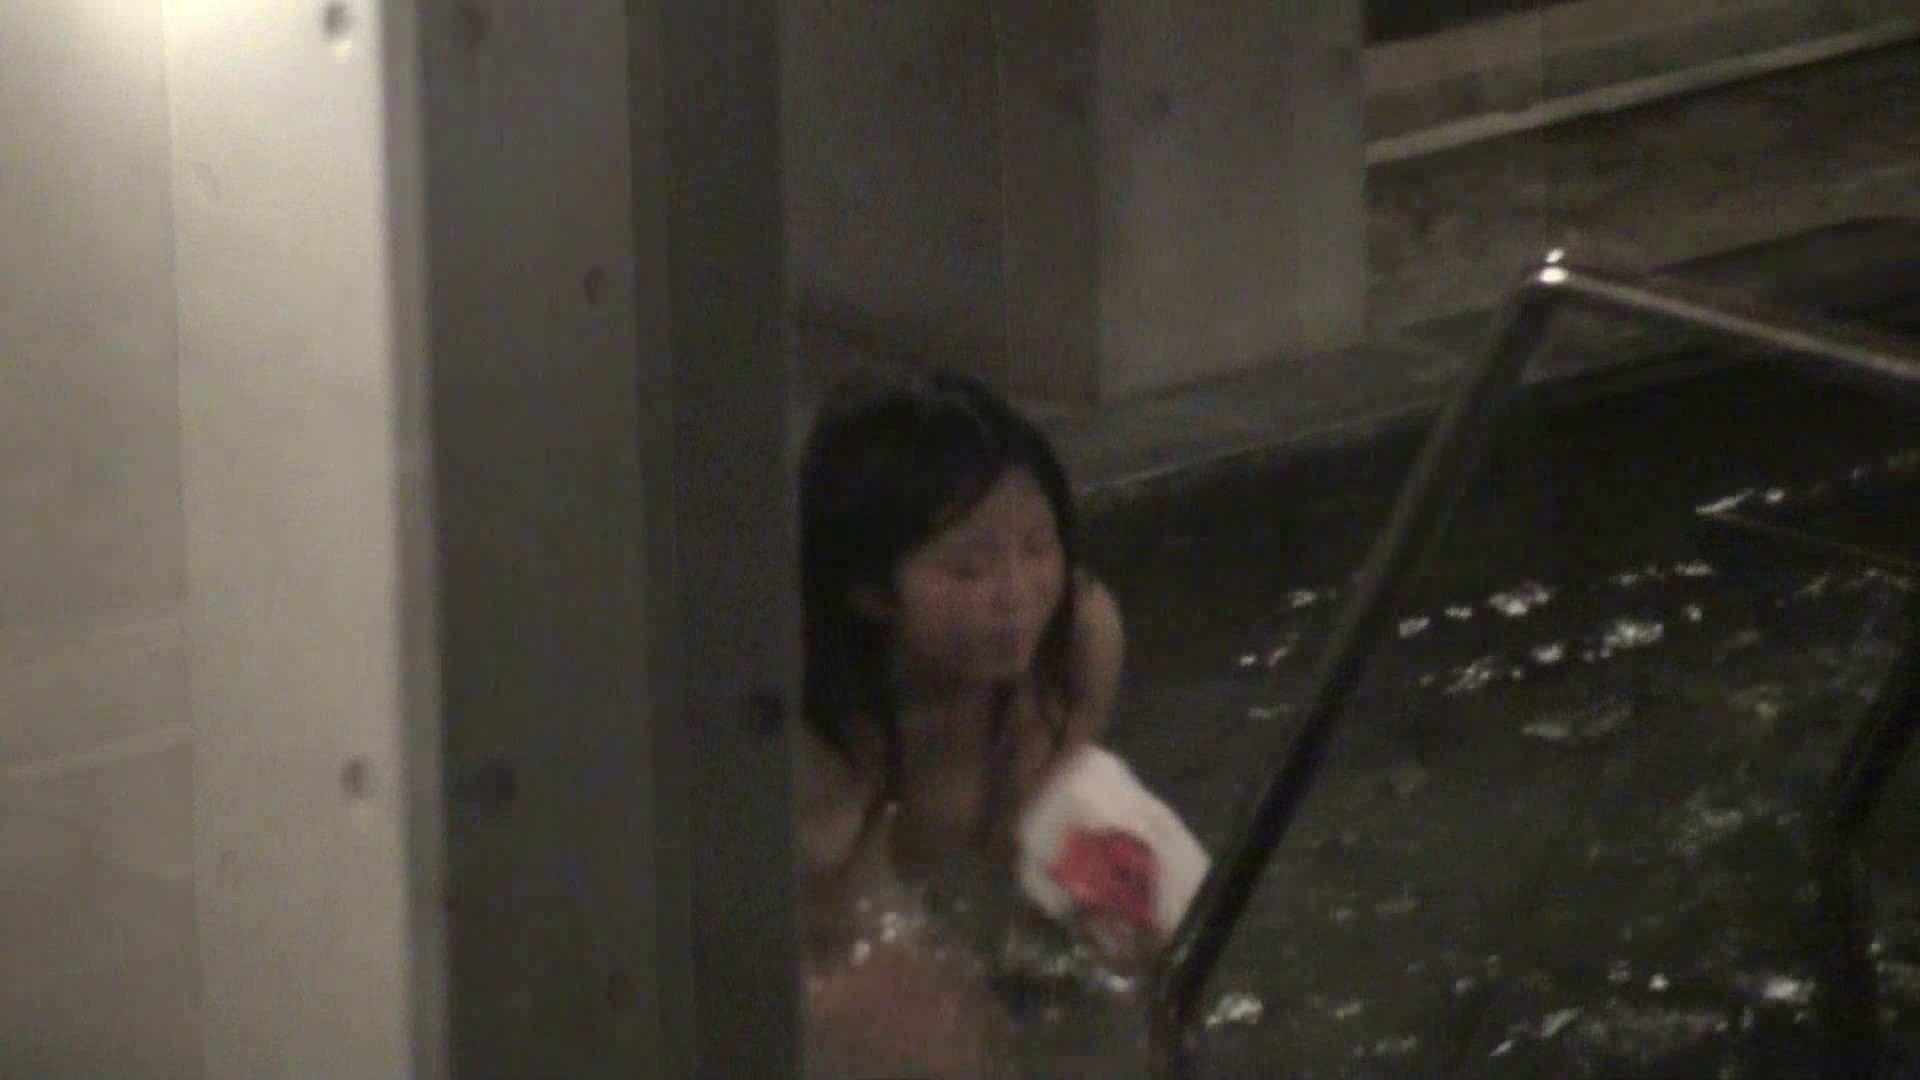 Aquaな露天風呂Vol.326 OLセックス | 露天  105画像 43